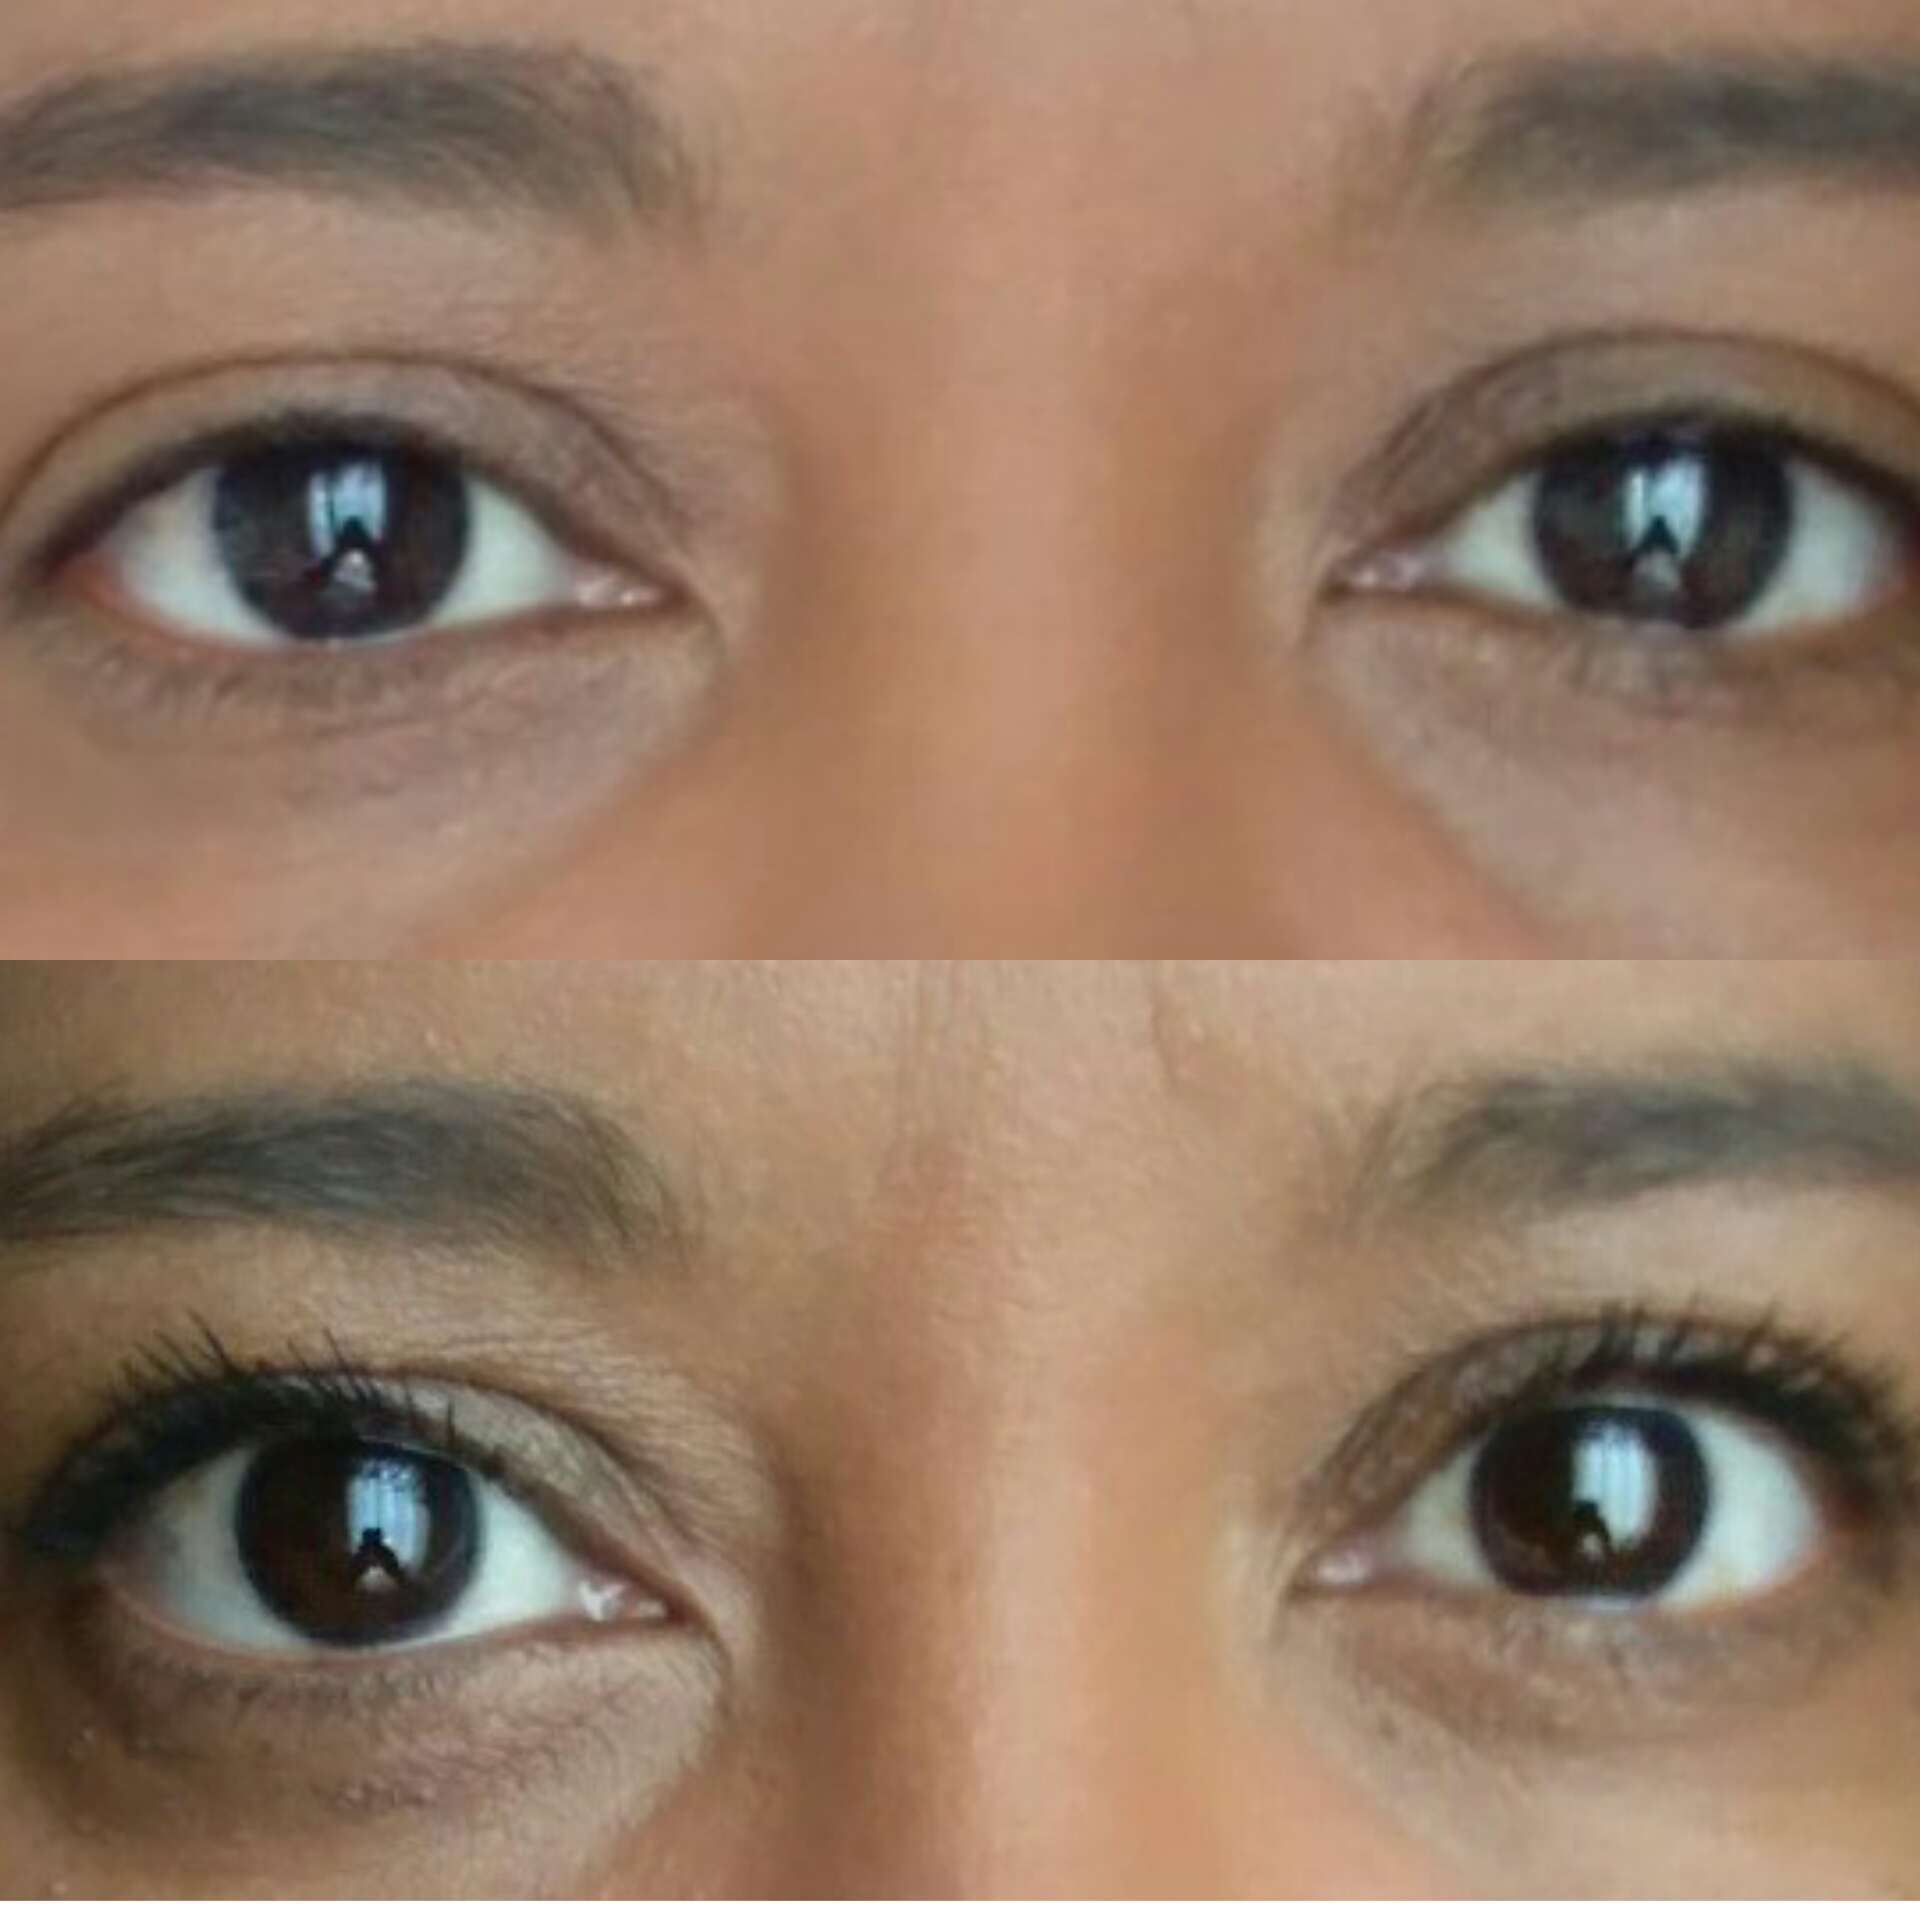 Mãe Usa Maquiagem | Máscara De Cílios Lash Intensity Mary Kay Antes e Depois